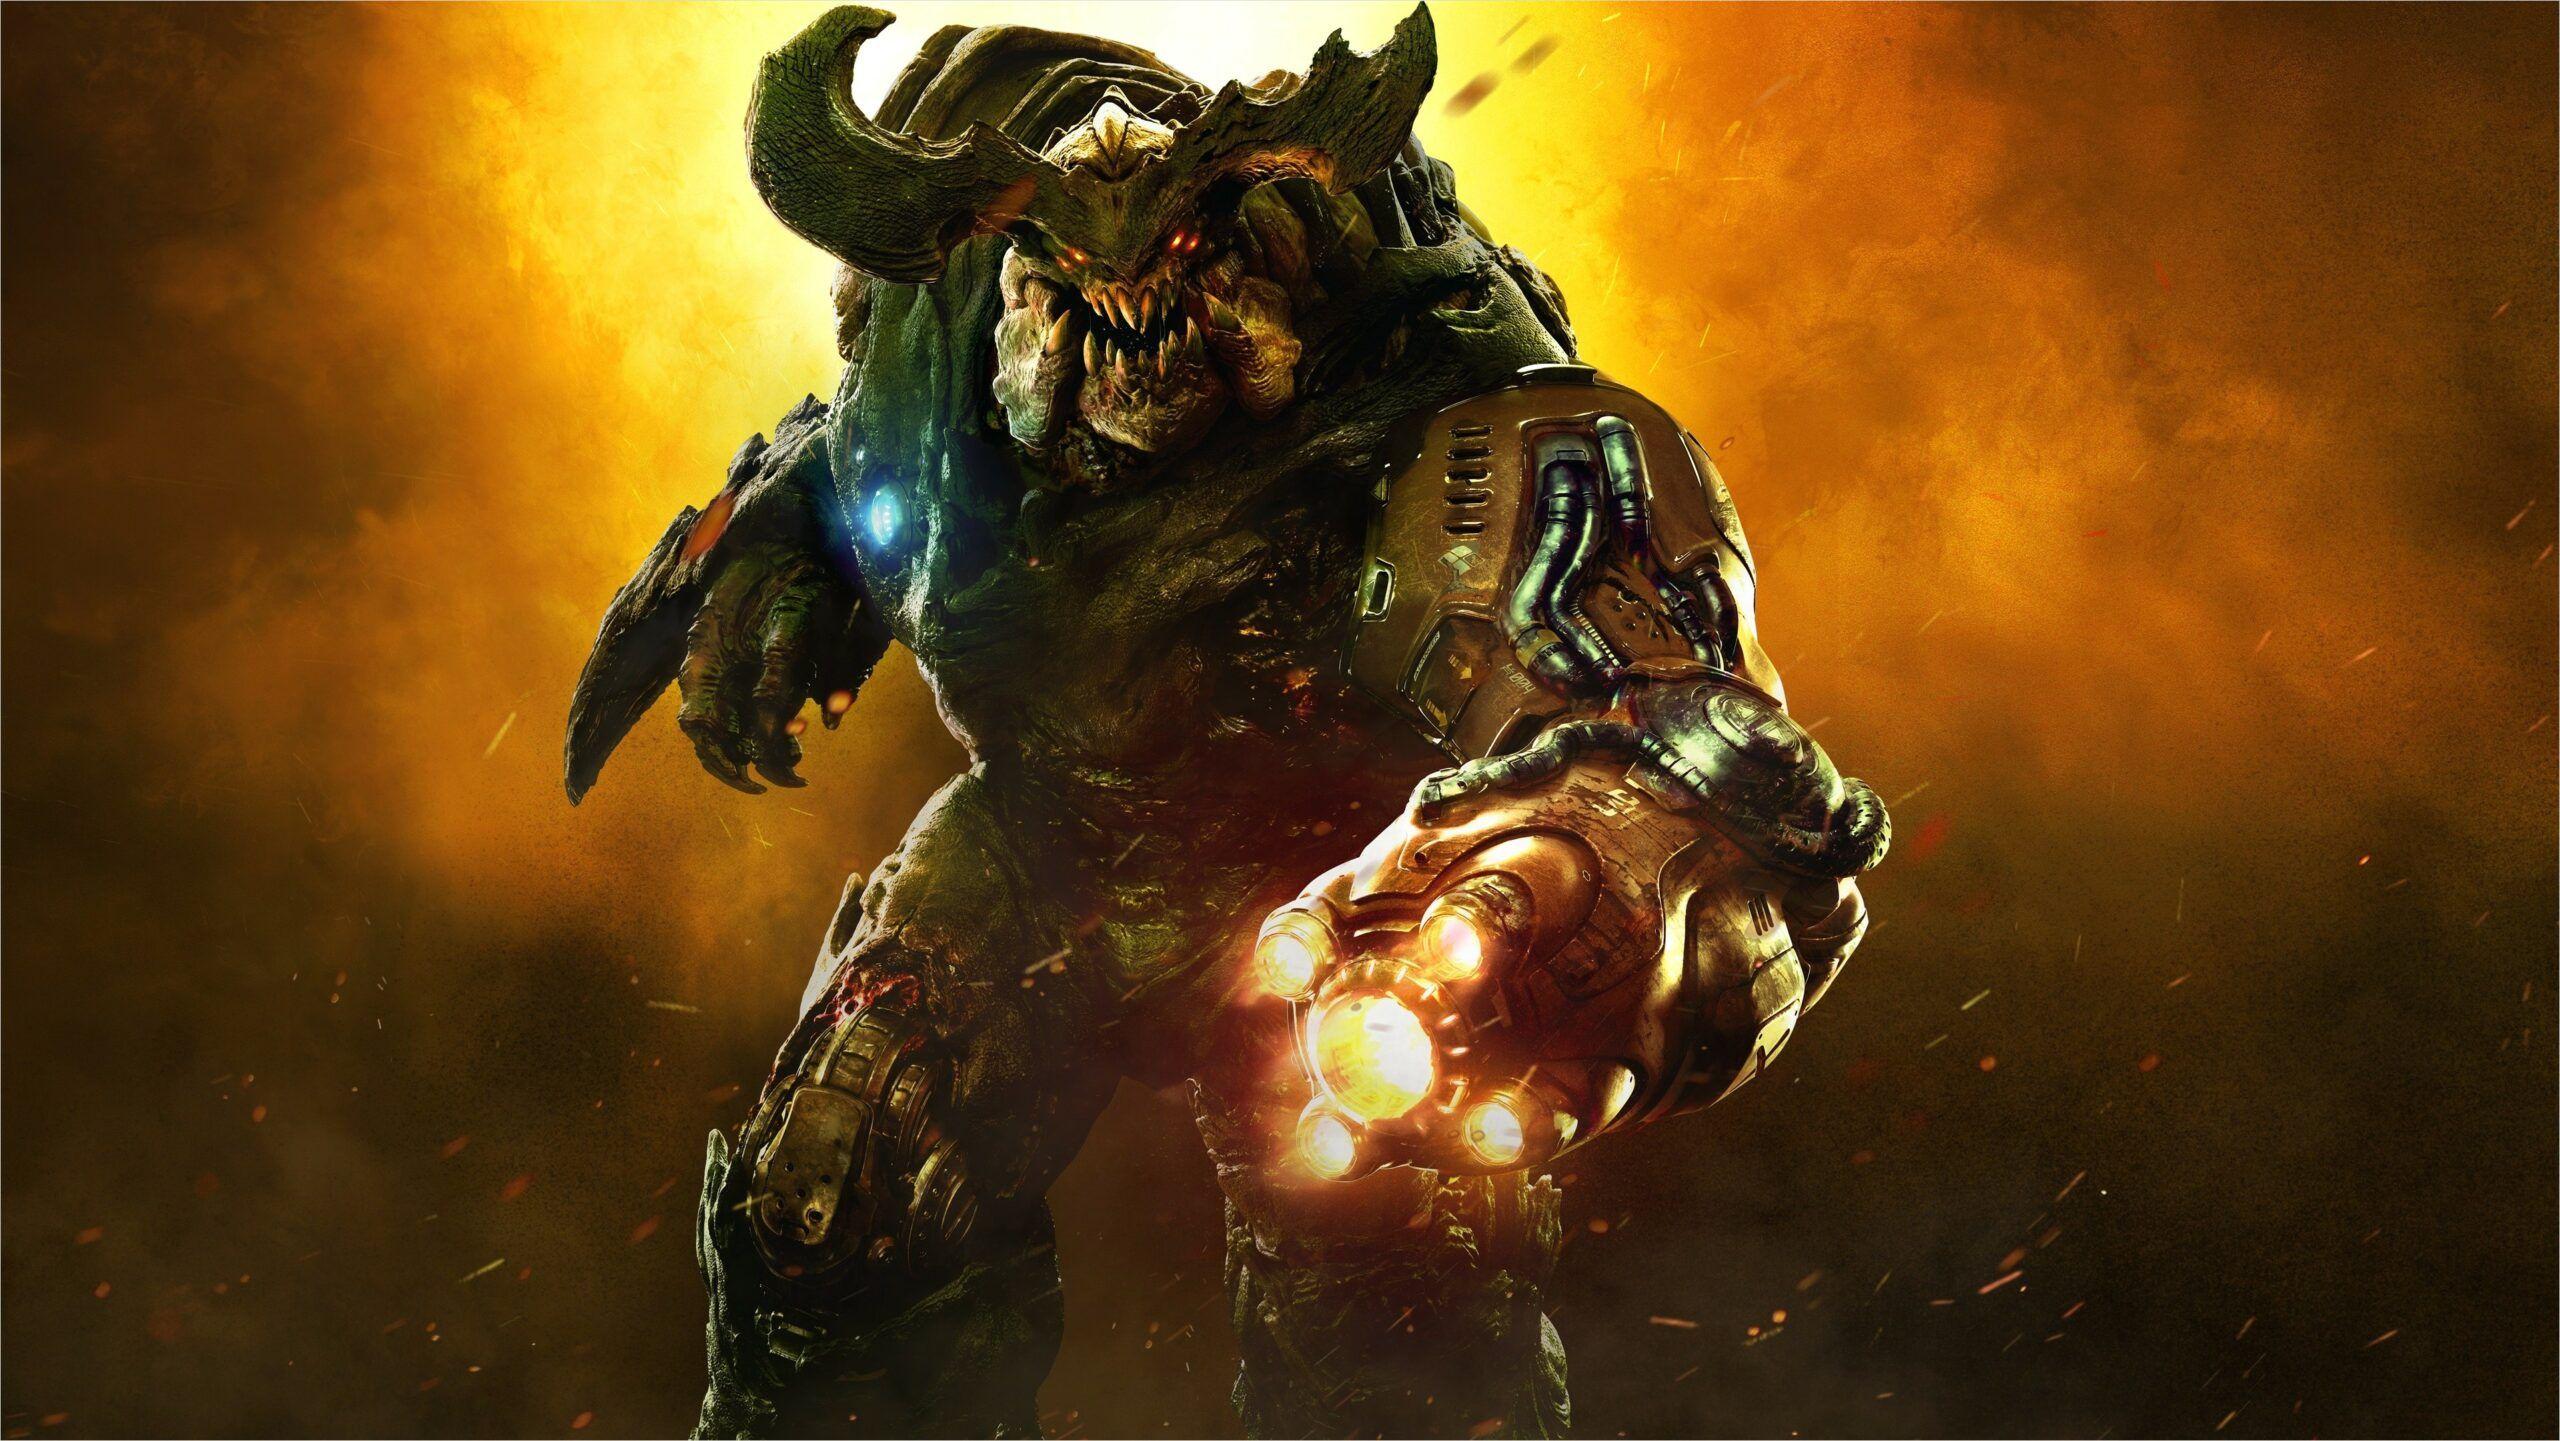 Doom 2016 4k Wallpaper In 2020 Digital Wallpaper Doom 2016 Doom